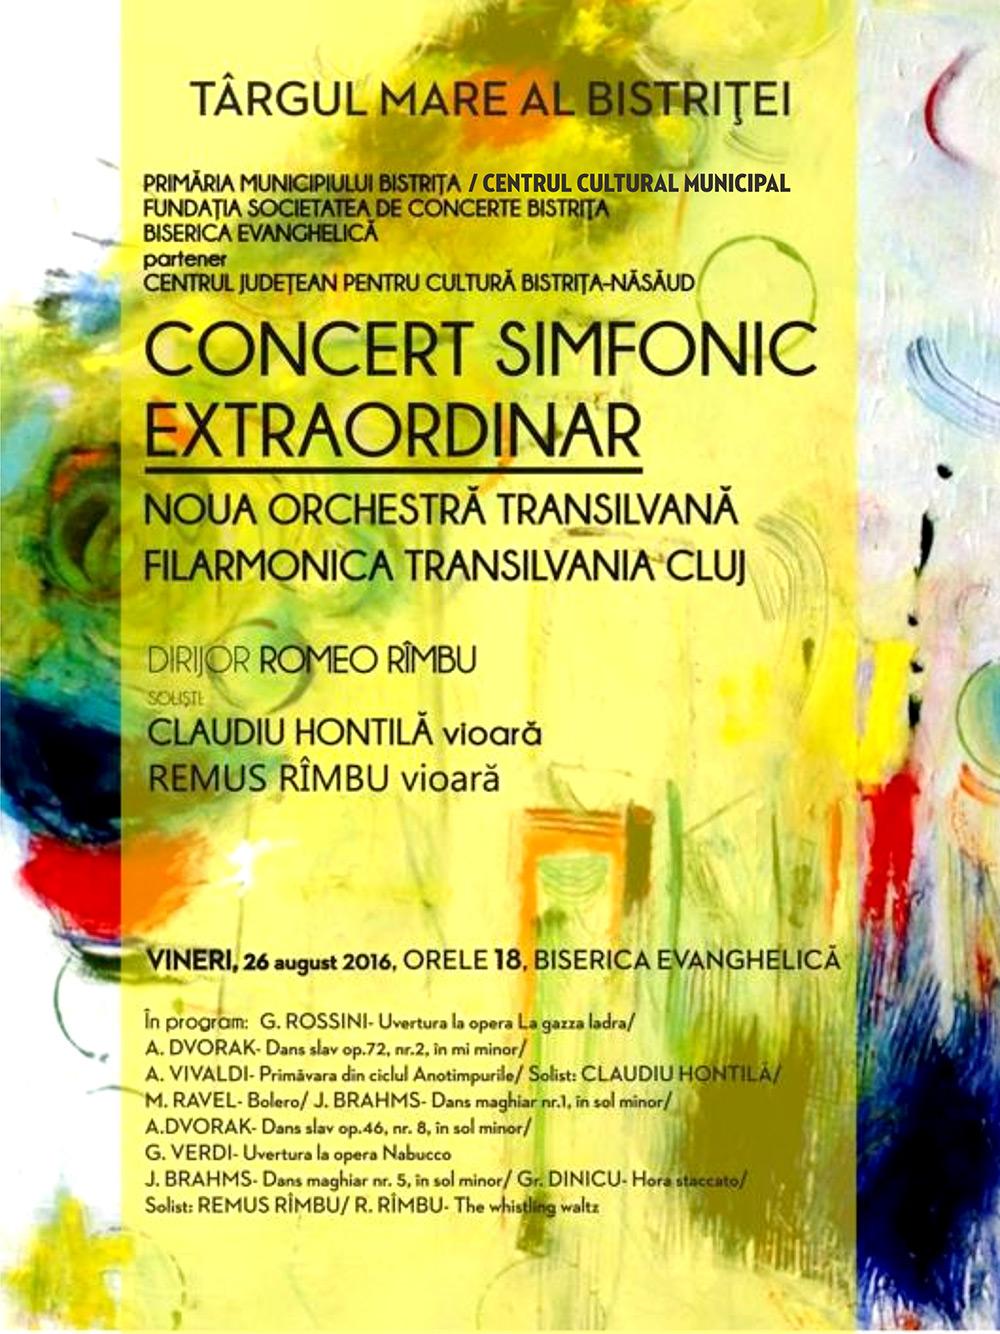 poster-concert-targul-mare-bistrita